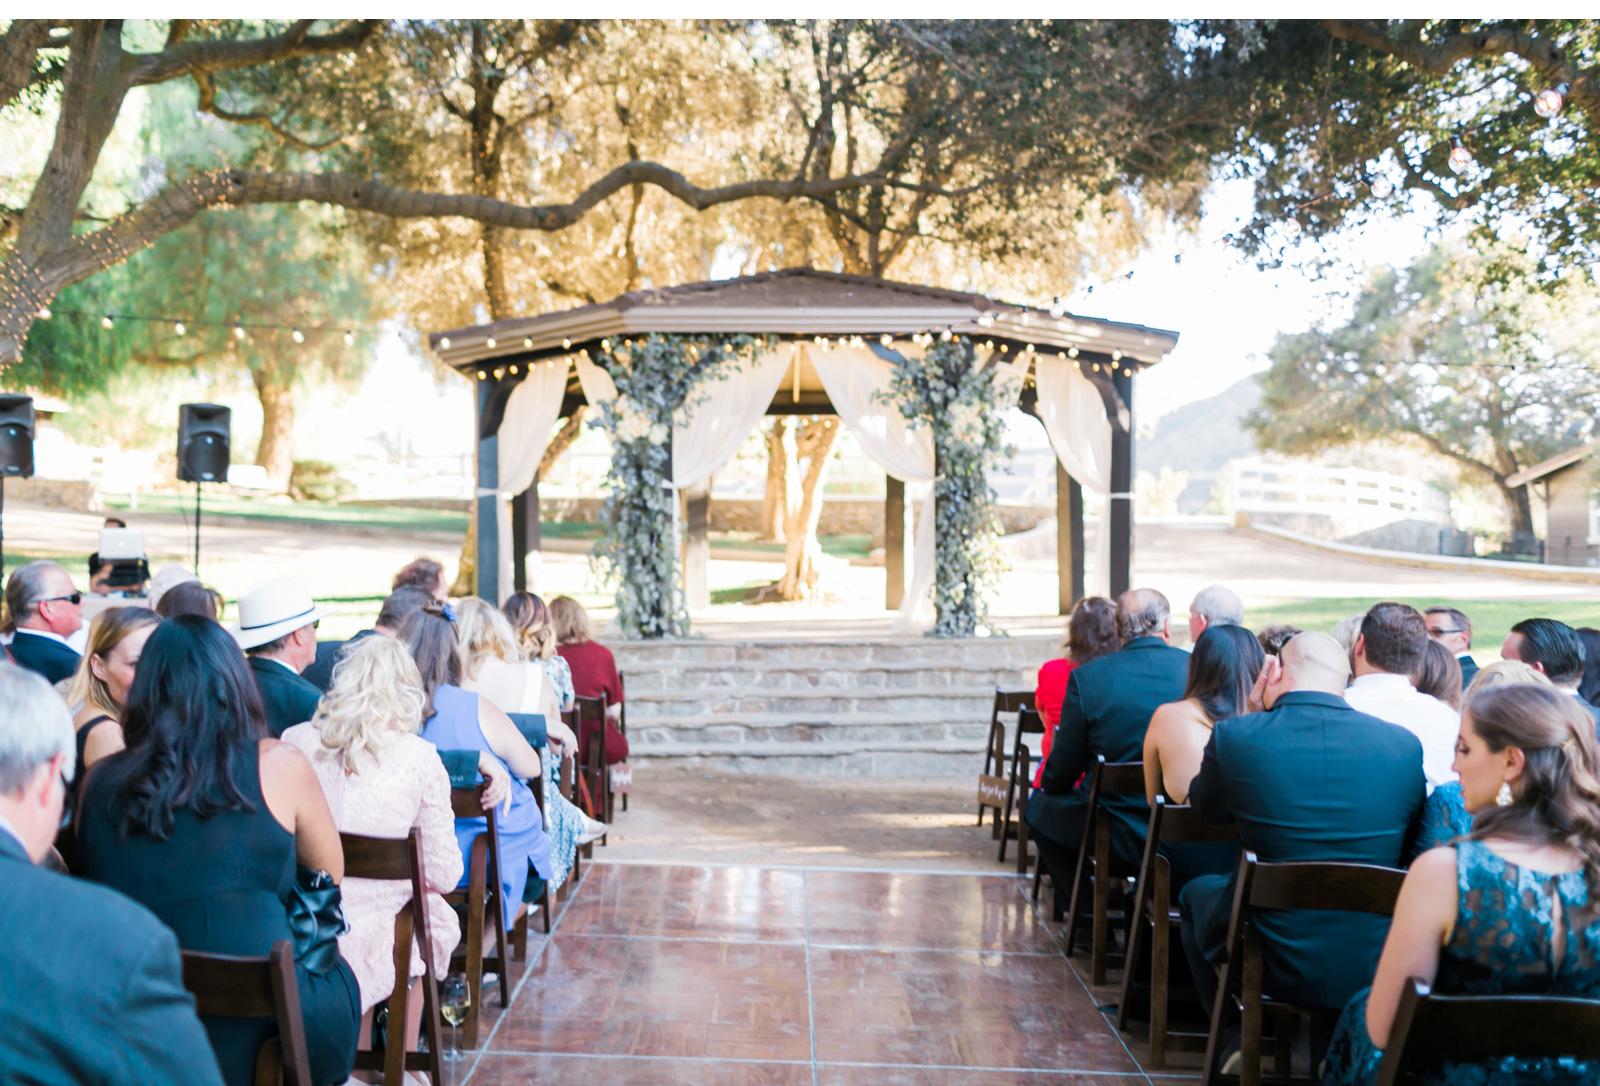 San-Luis-Obispo-Wedding-Photographer-Style-Me-Pretty-Natalie-Schutt-Photography_11.jpg